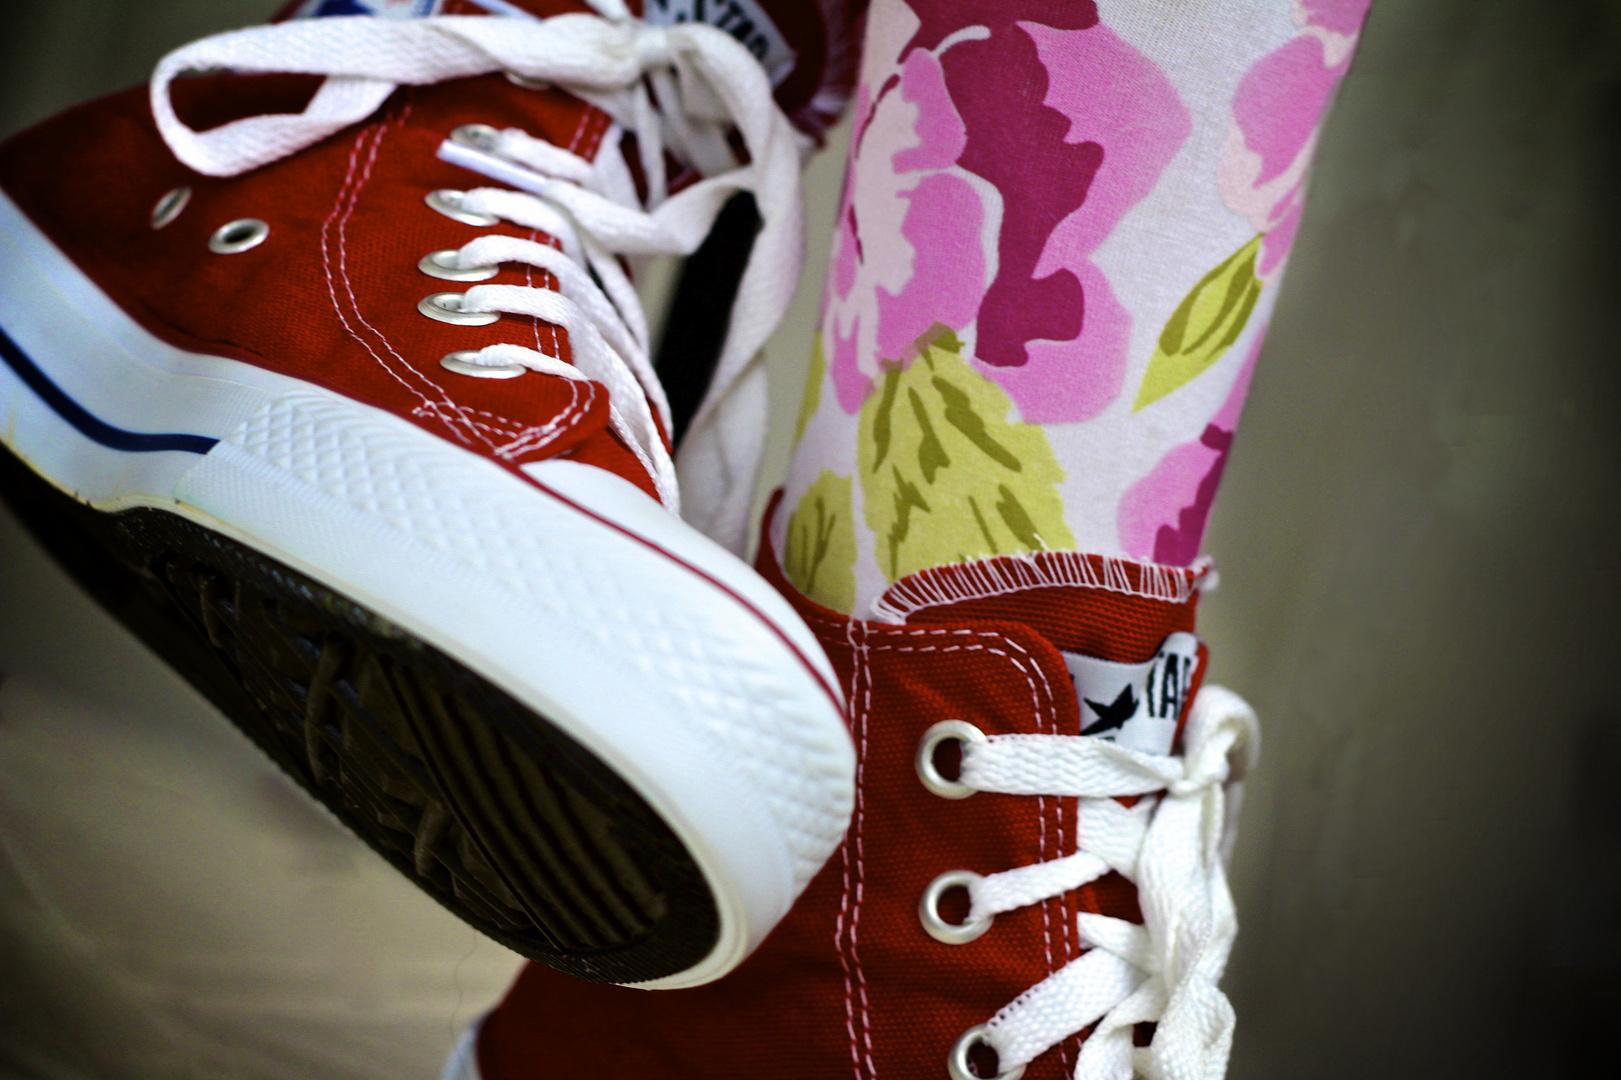 Chucks & Socks